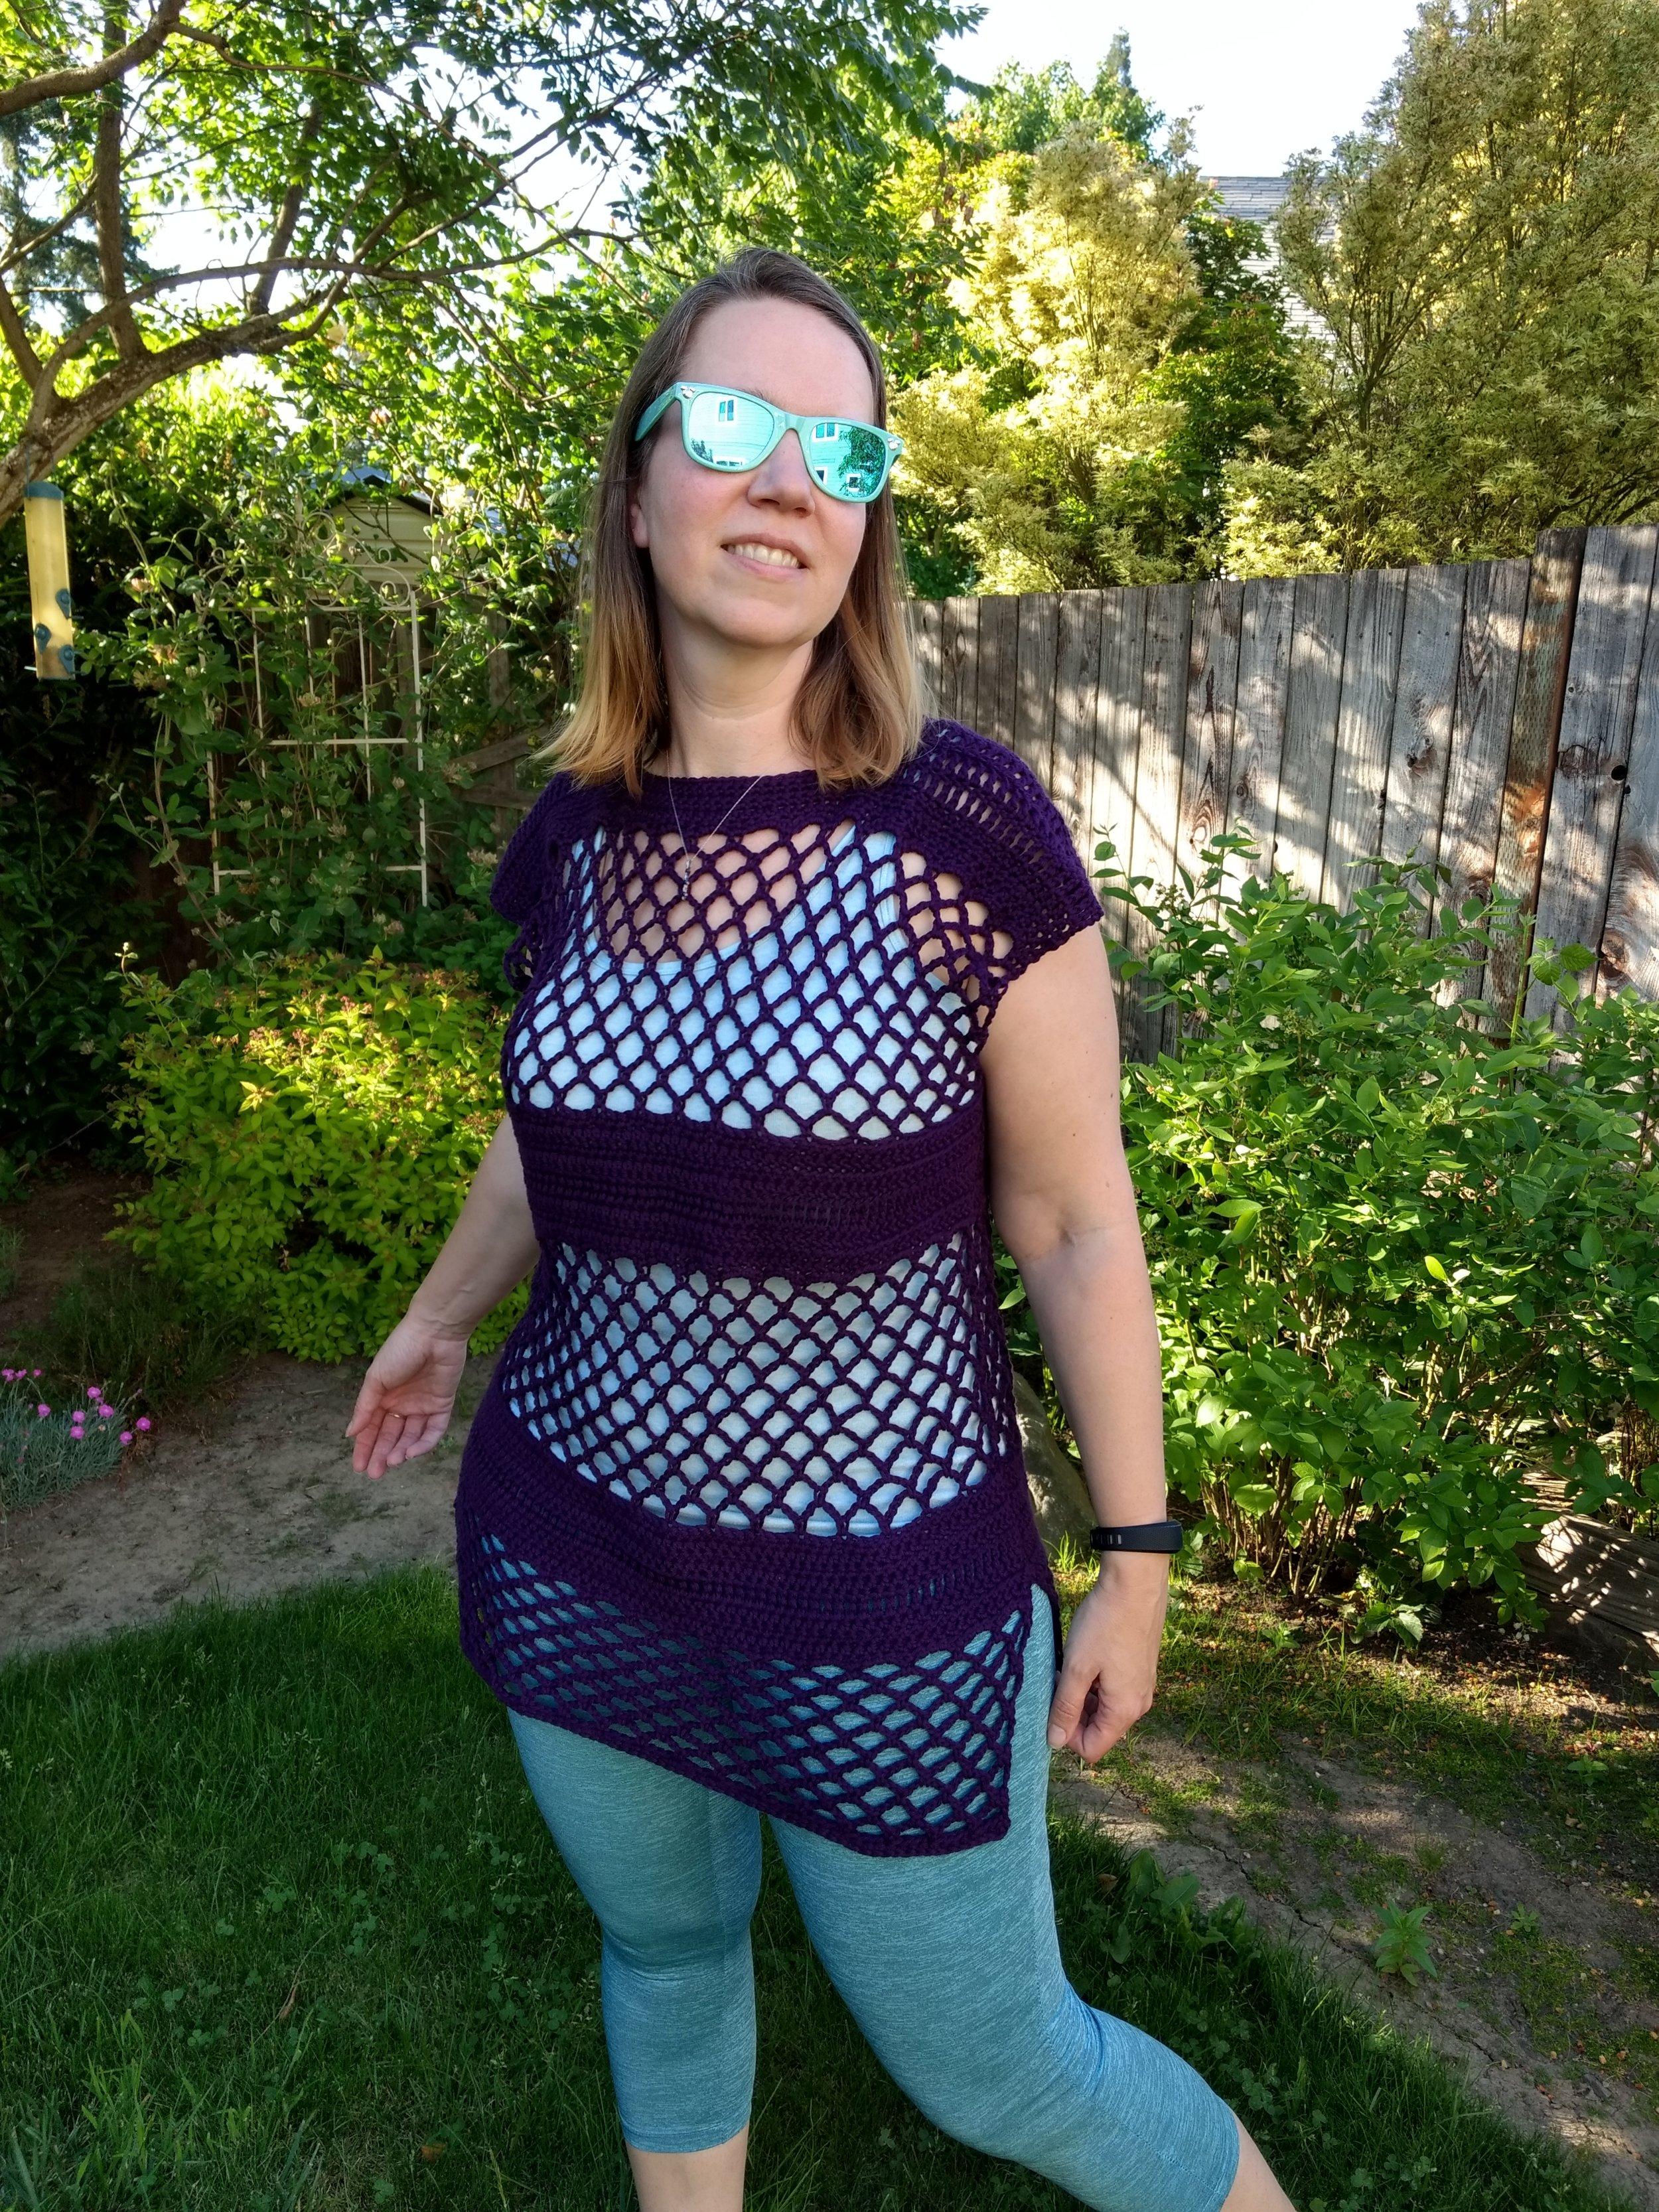 Sanibel_Pool-Dress_free-crochet-pattern-33.jpg